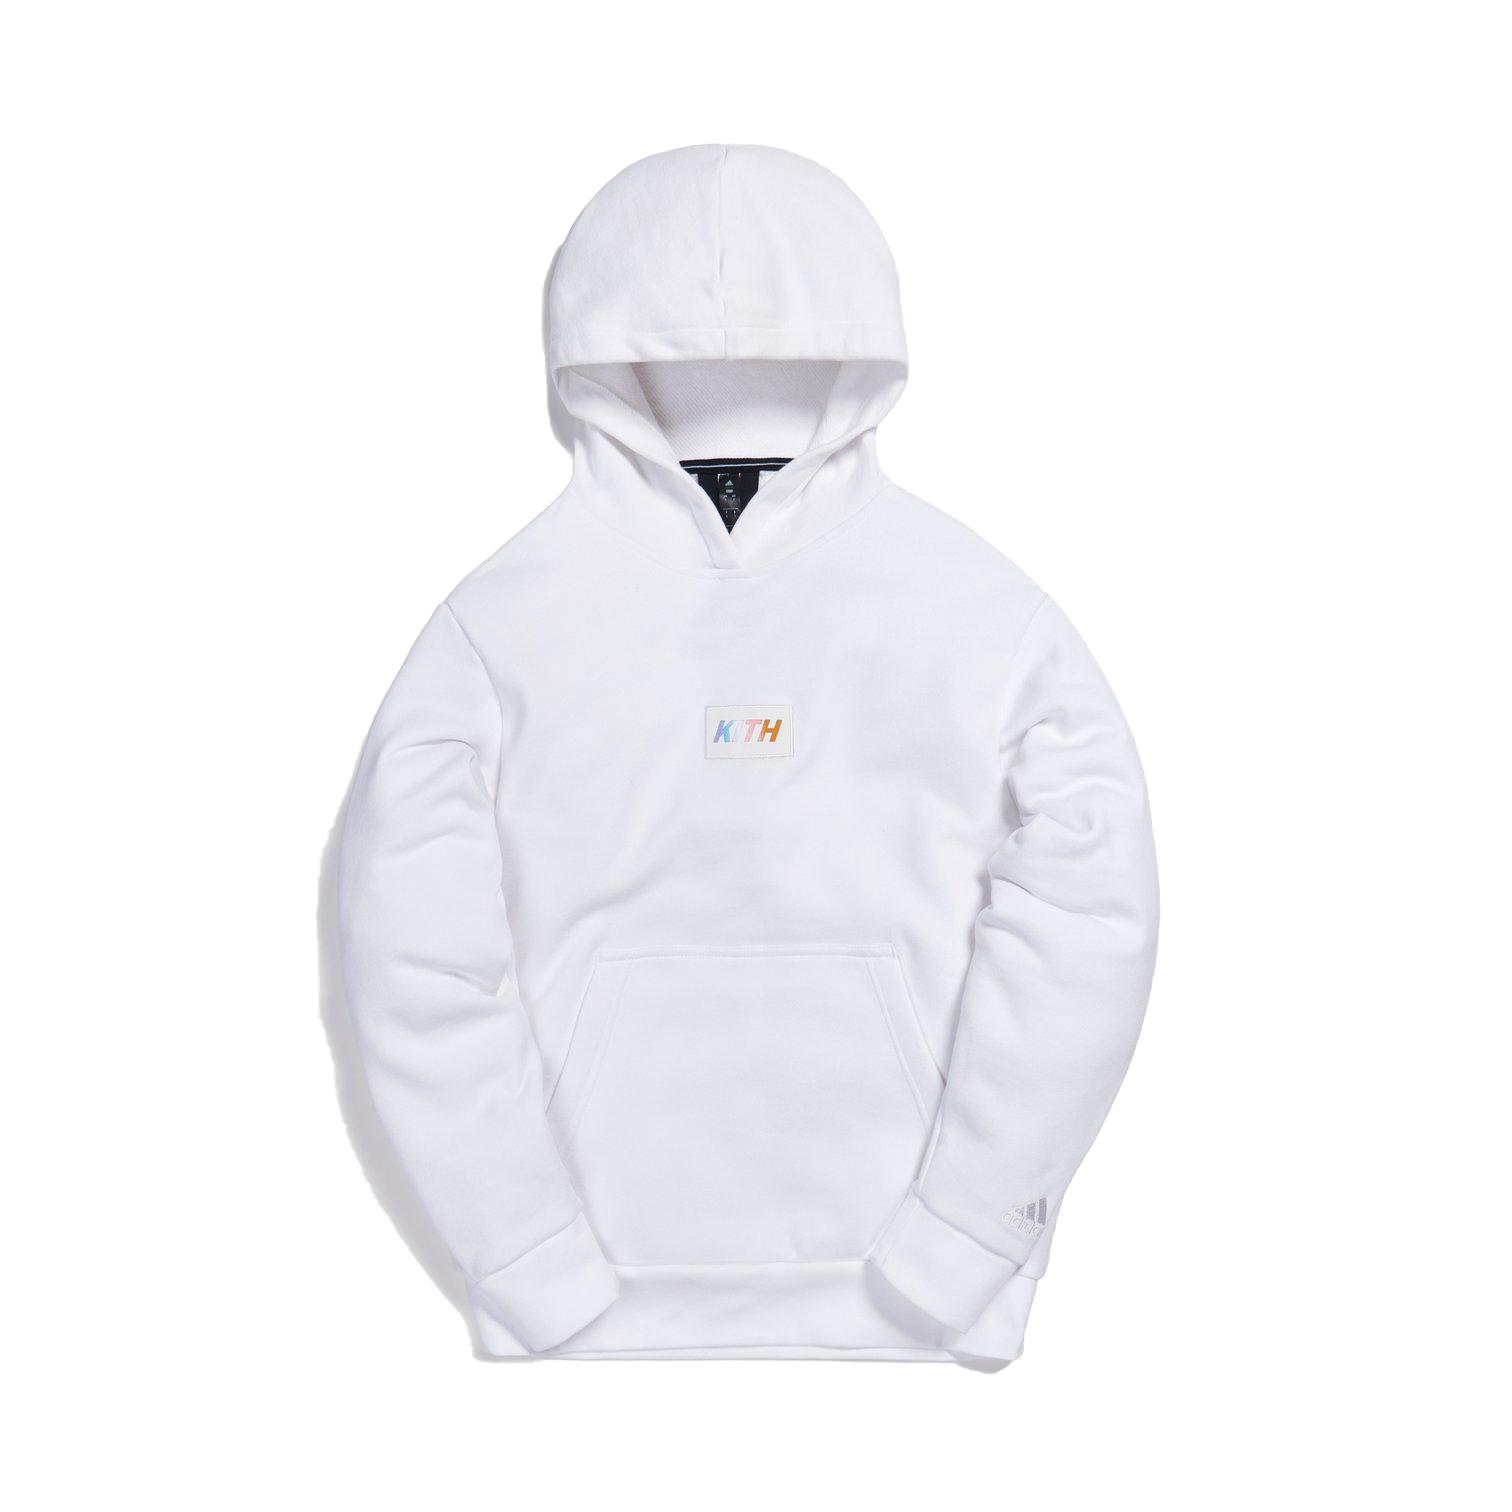 adidas yeezy hoodie white